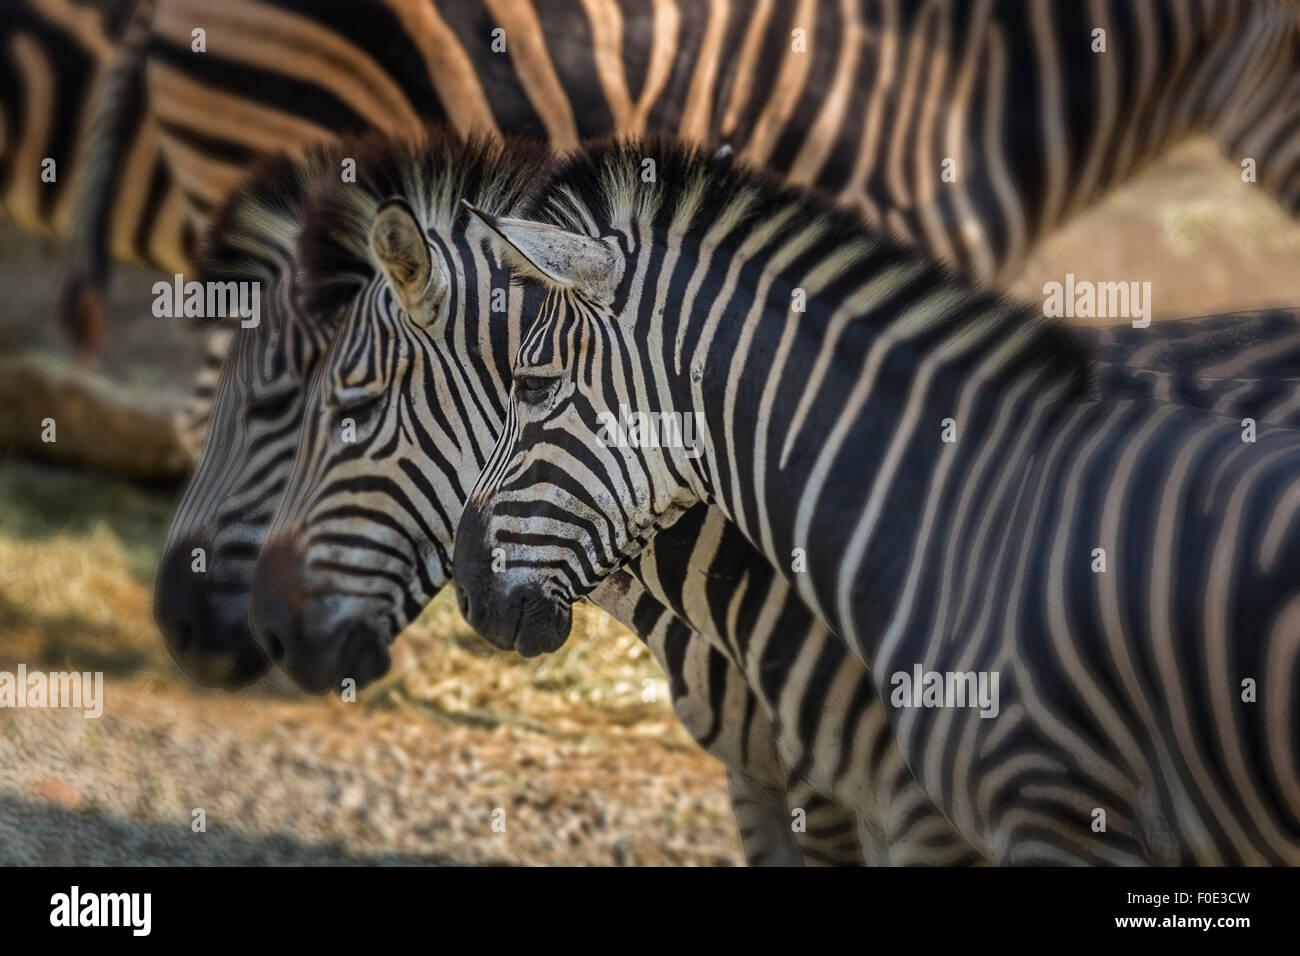 Zebra at zoo in Taiwan - Stock Image